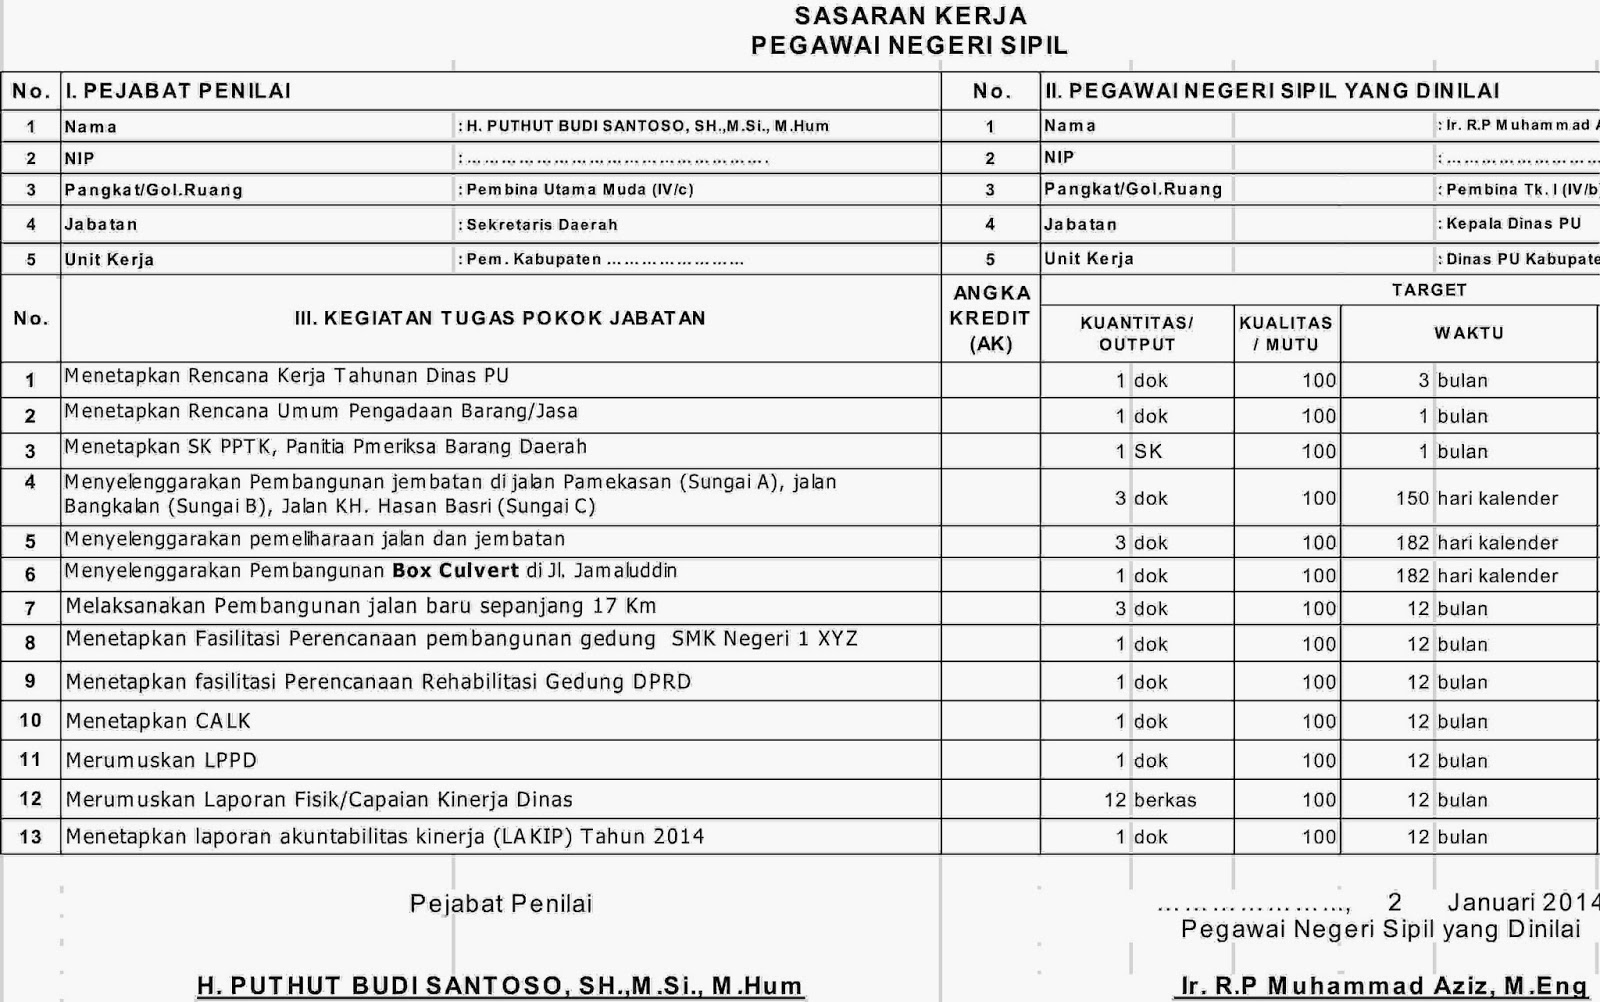 Contoh Rencana Kerja Bulanan Kecamatan Kertas Kerja Perseorangan Contoh Kkp Laporan Cara Penyusunan Skp Pejabat Struktural 2 Skplinks